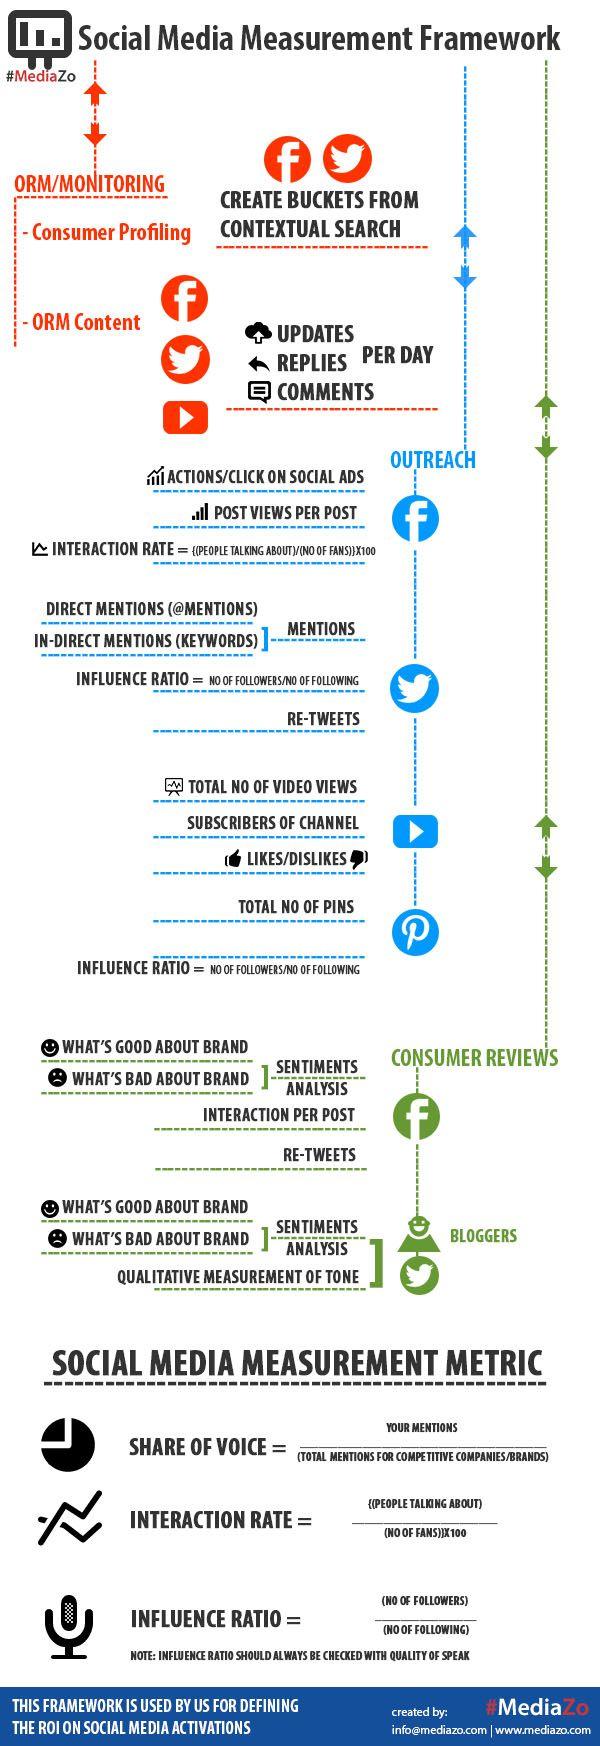 Marco de medición del rendimiento de #SocialMedia #infografia @Alfredo Malatesta Vela